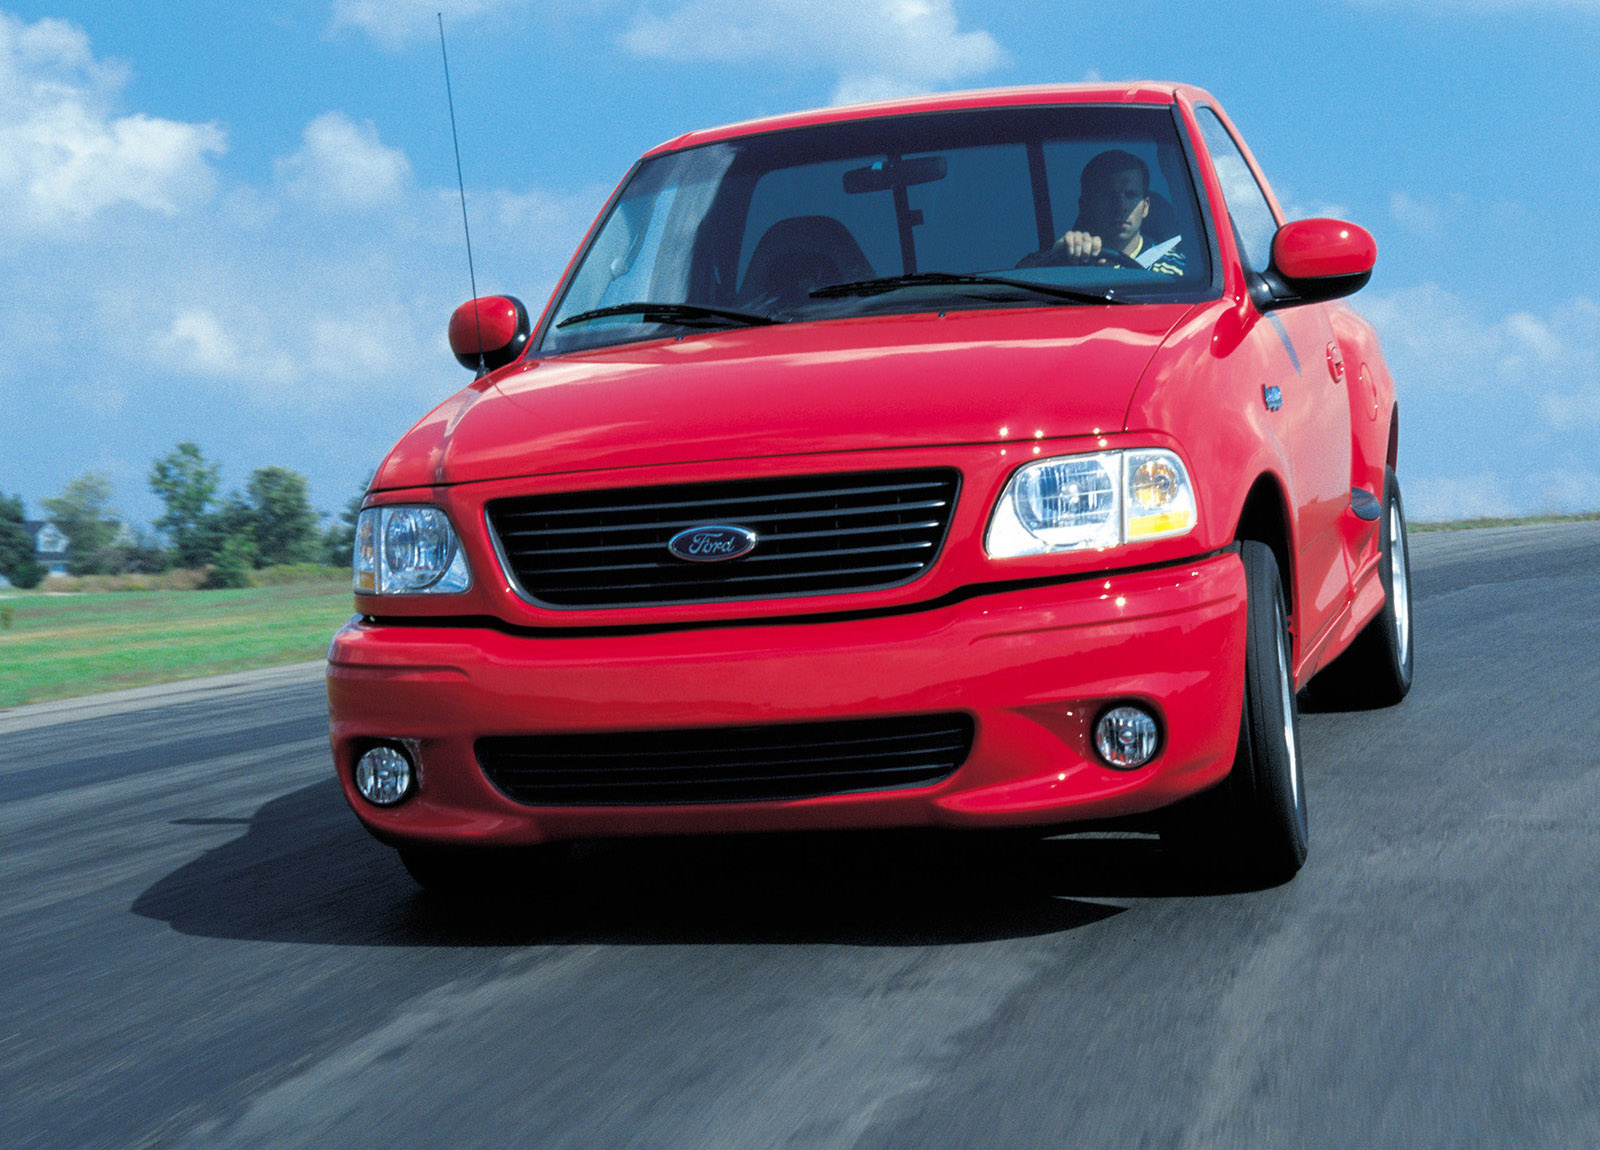 Ford Svt Lightning >> 2001 Ford F-150 SVT Lightning - HD Pictures @ carsinvasion.com